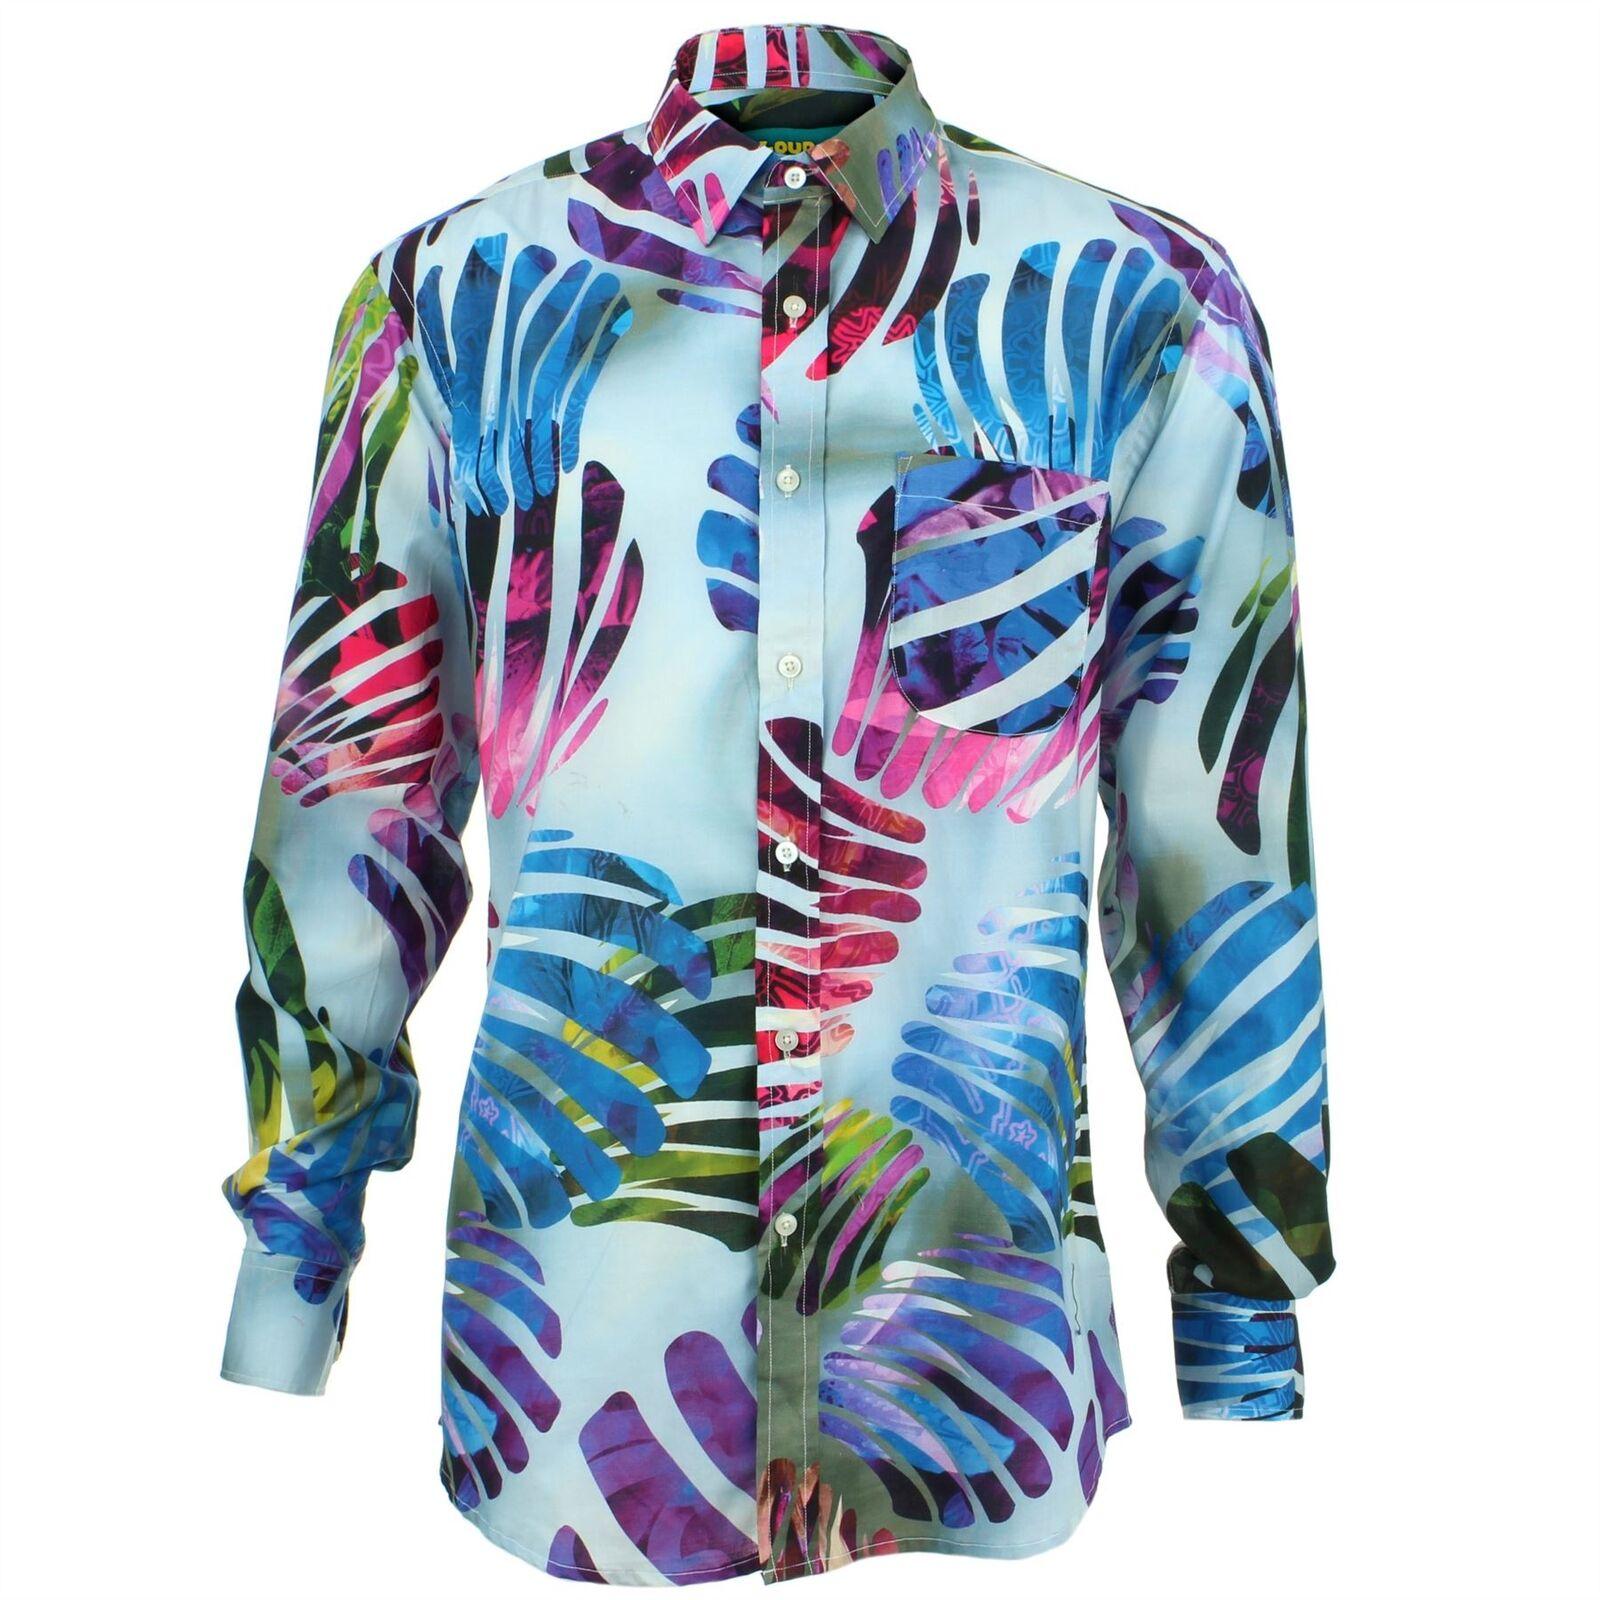 Men's Loud Shirt REGULAR FIT Abstract bluee Retro Psychedelic Fancy